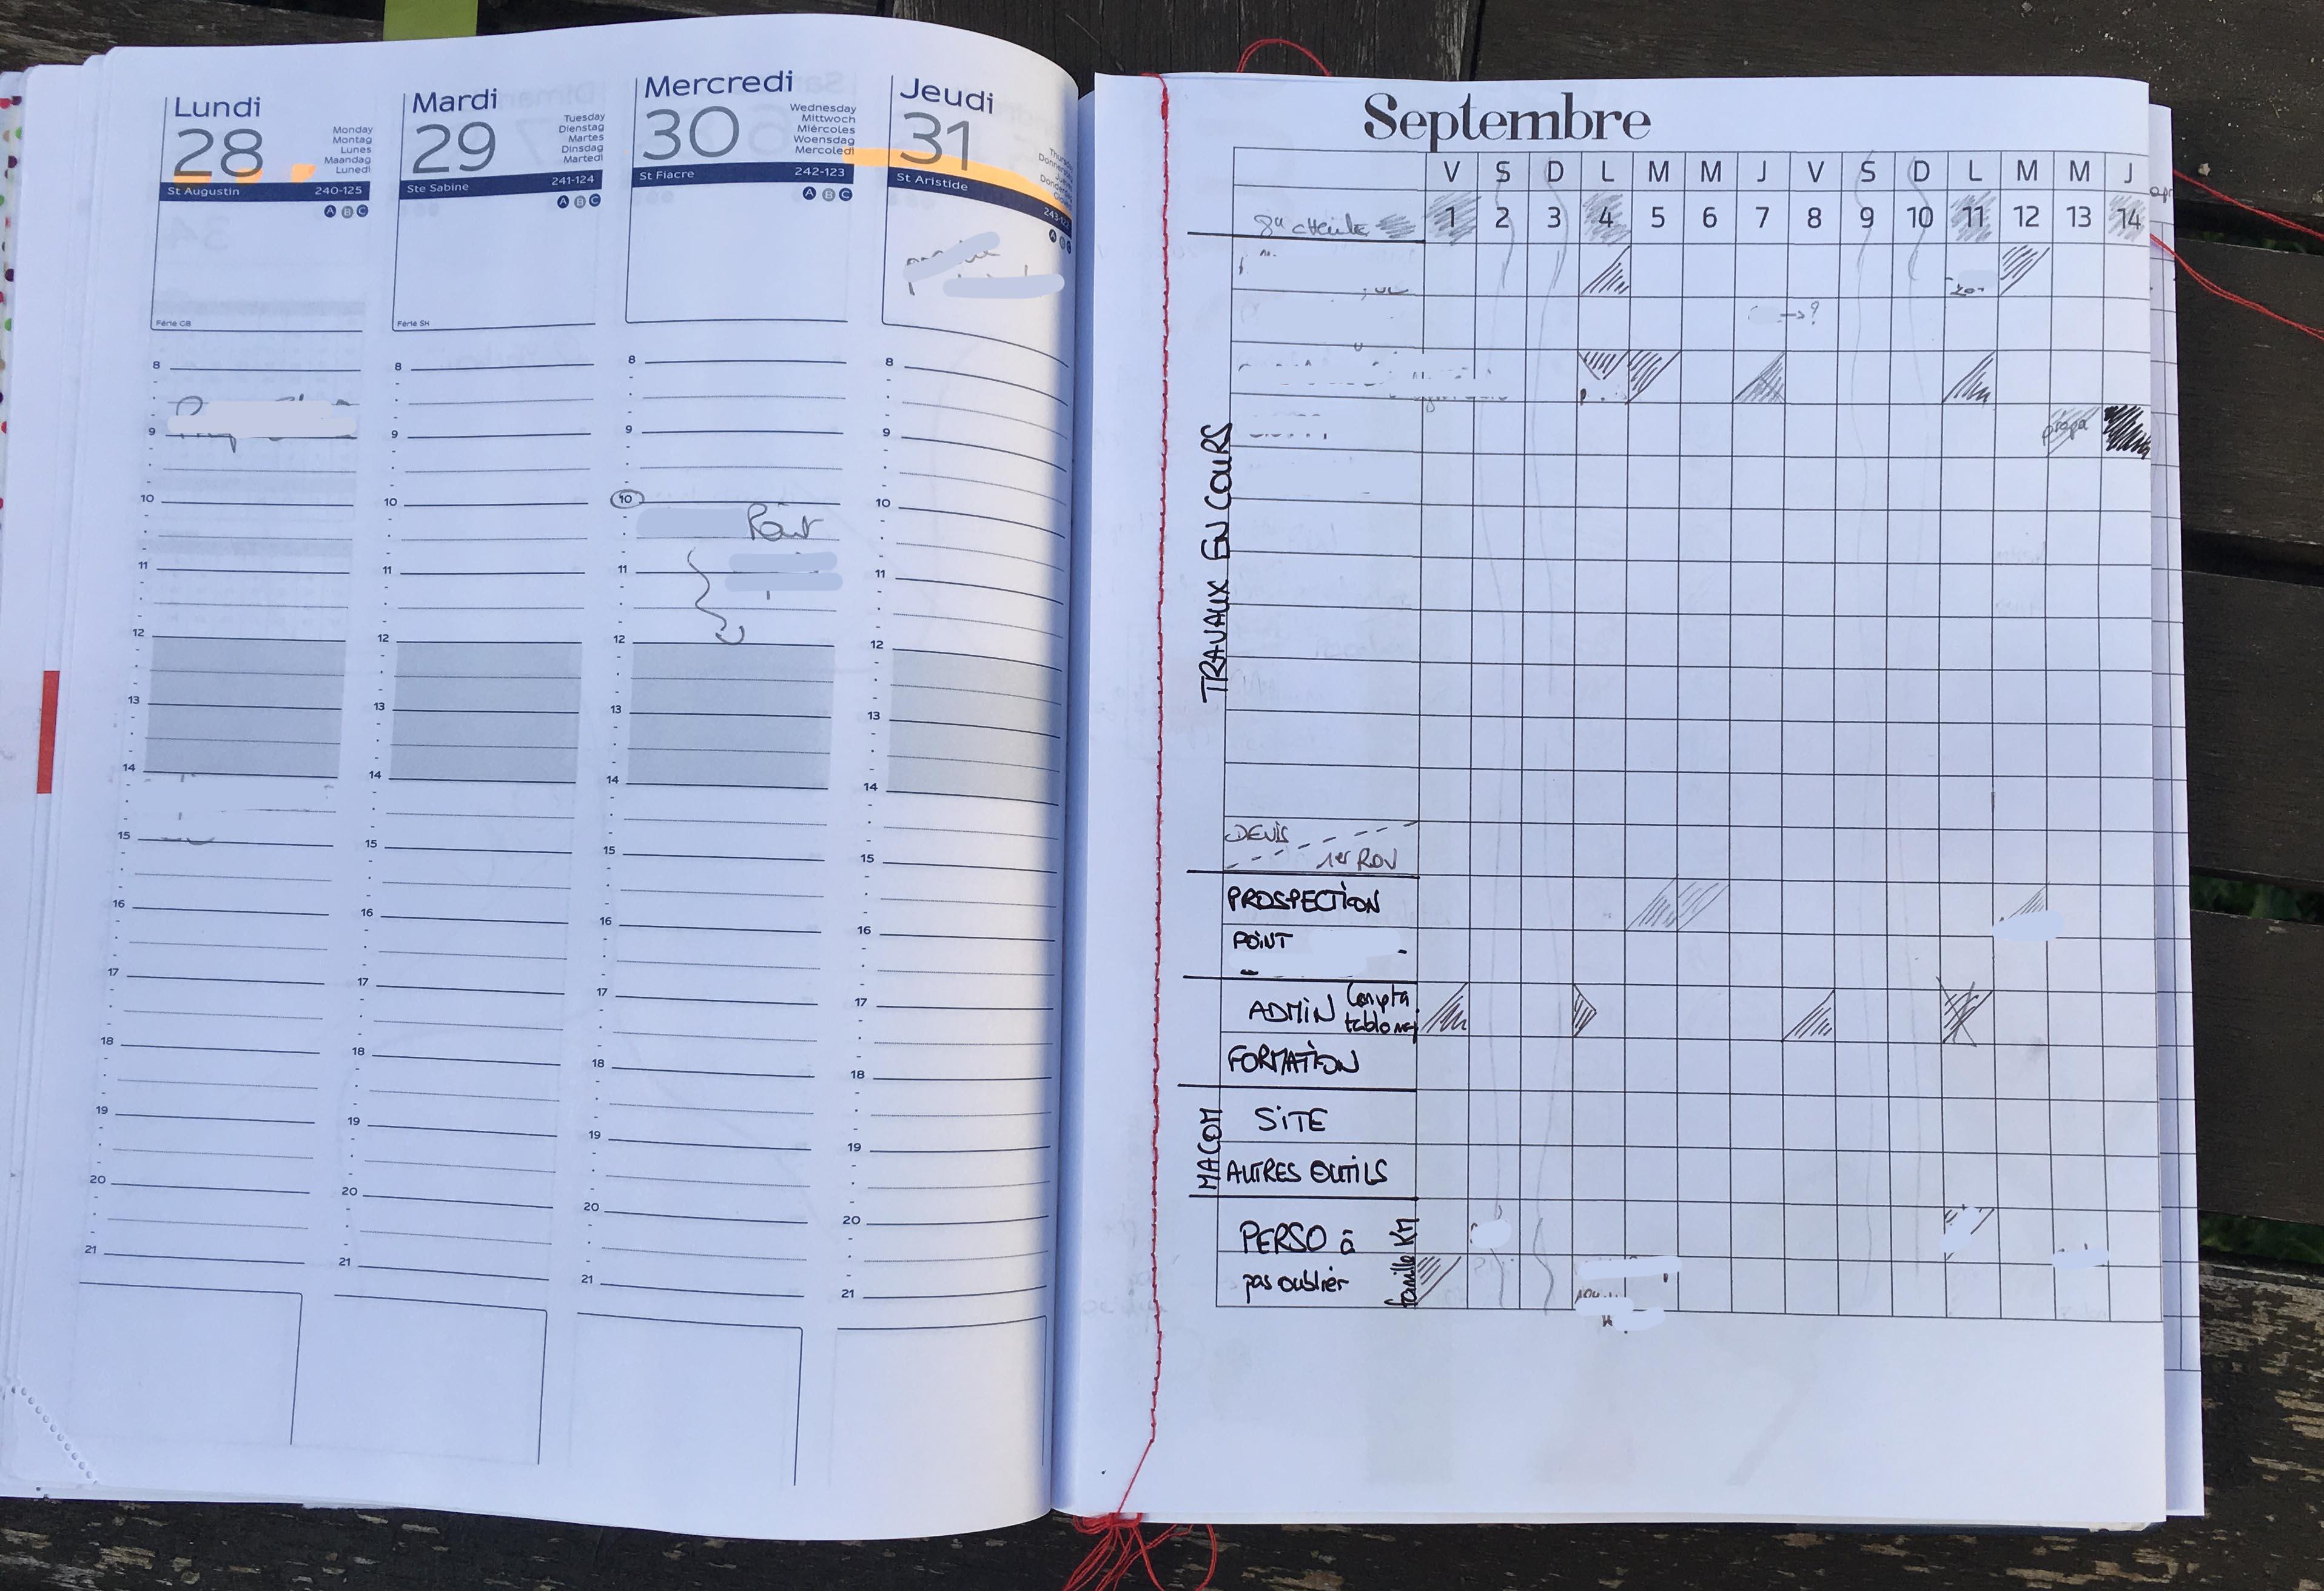 conseil en communication retroplanning planning bullet journal kmscommunication